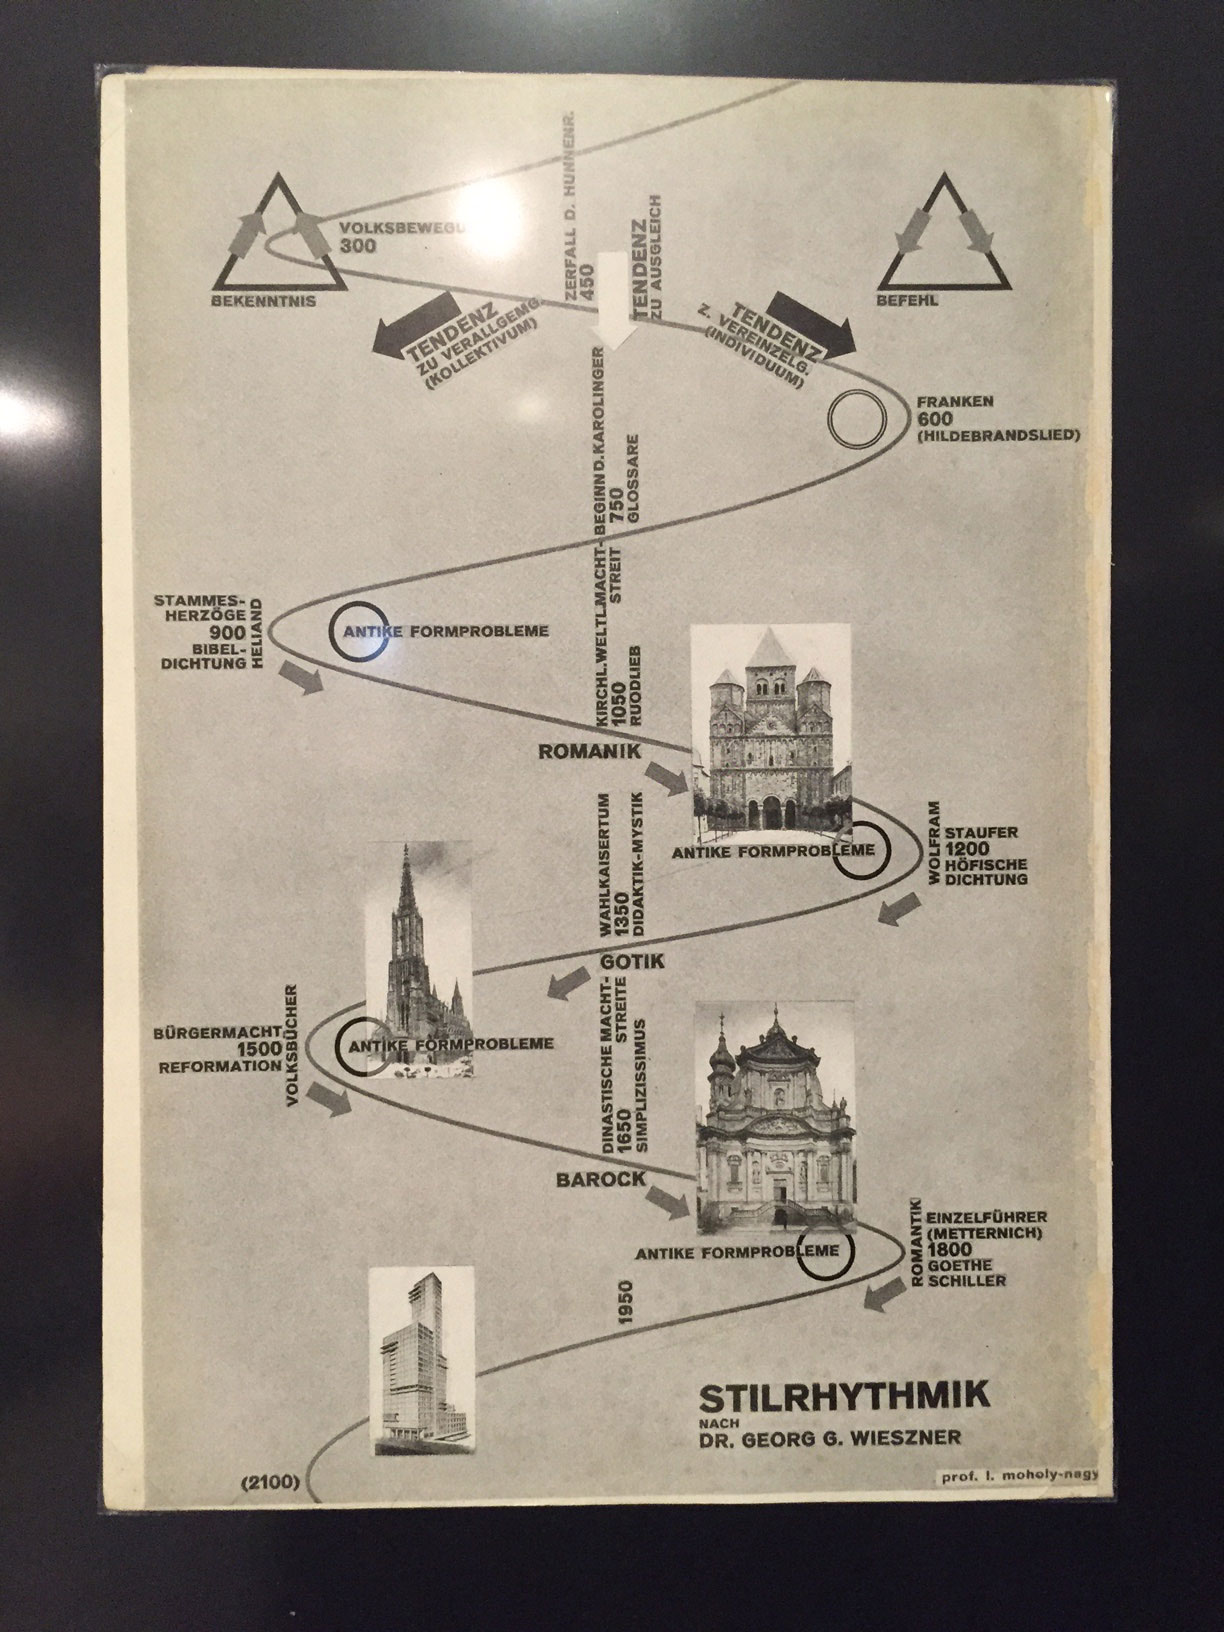 Opinie Harm Tilman Bauhaus